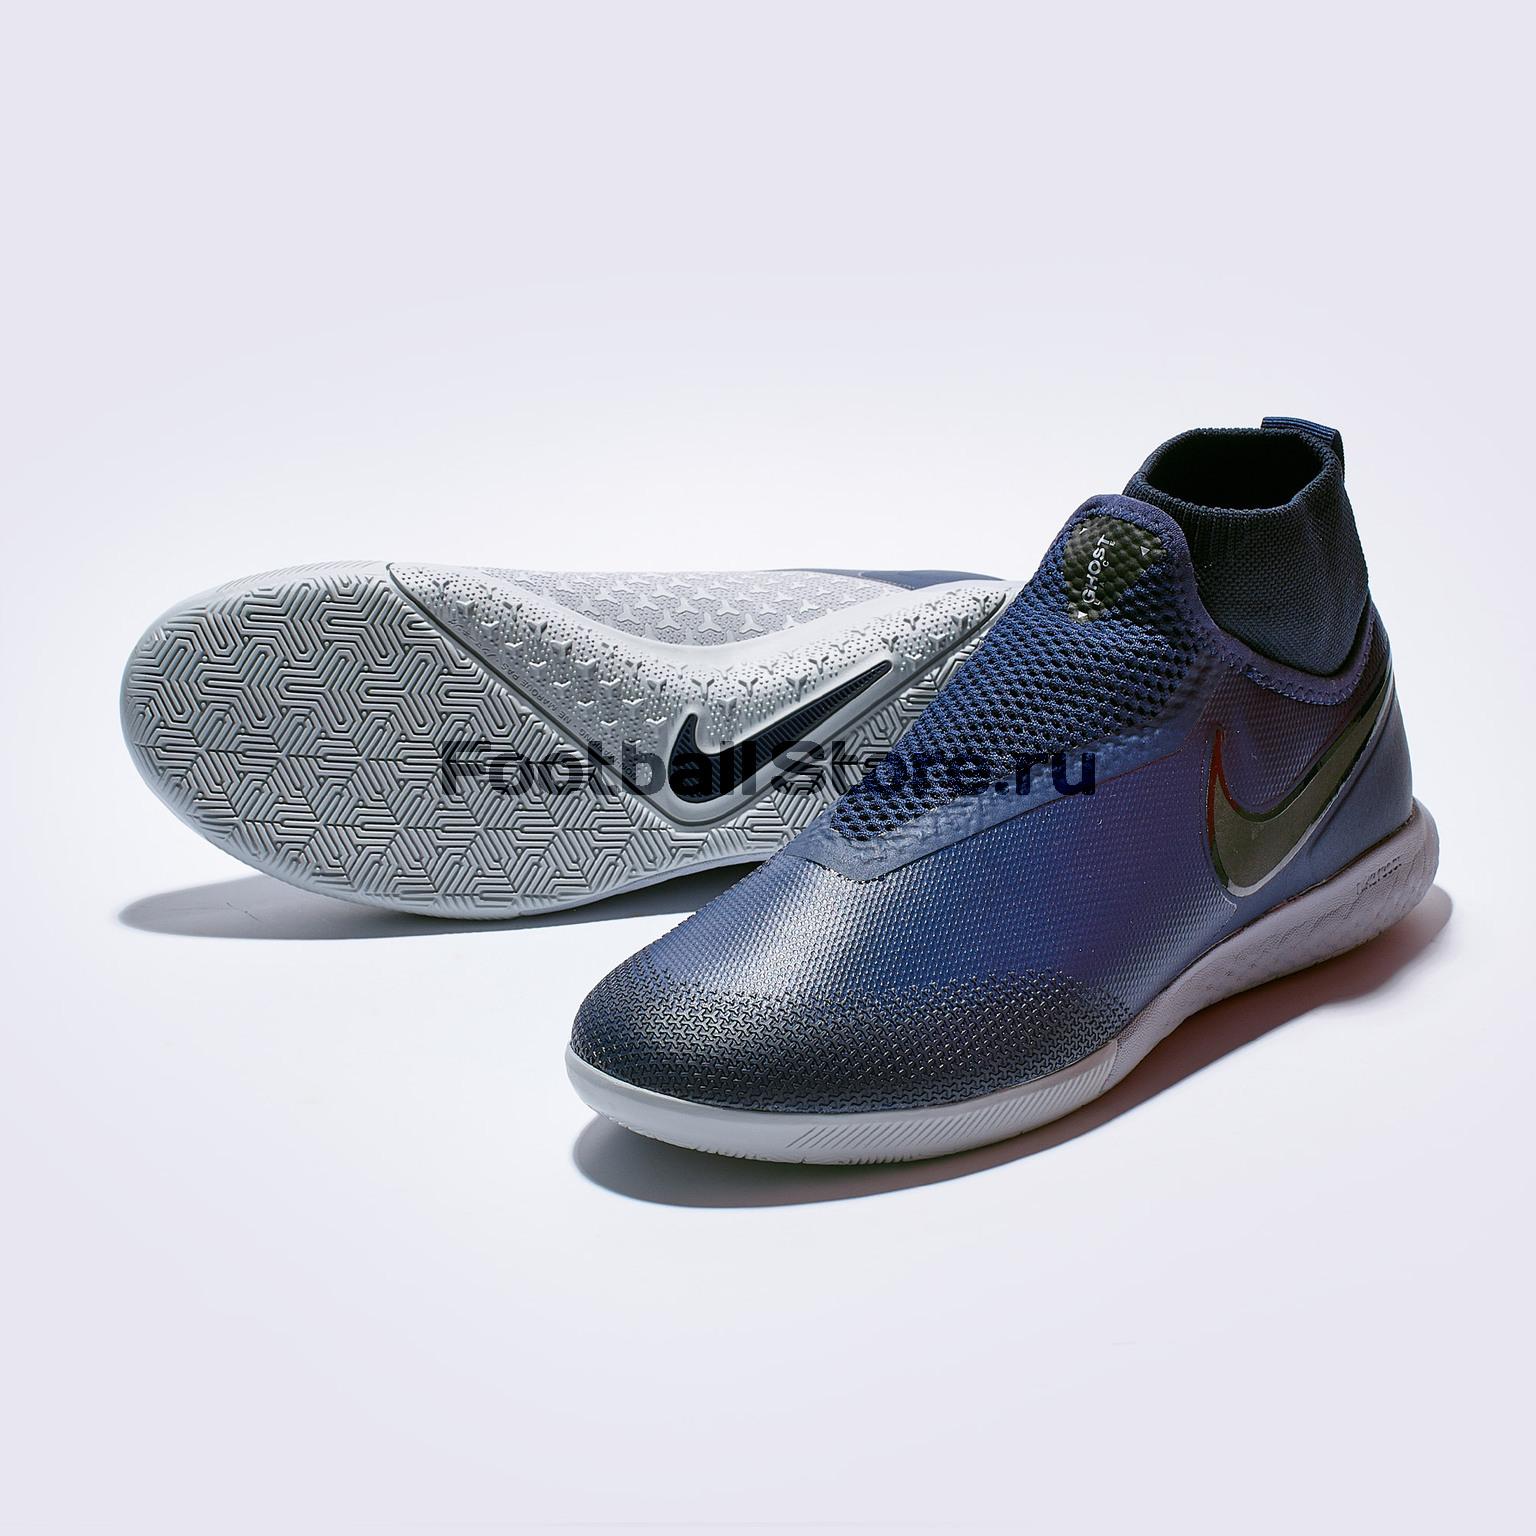 Футзалки Nike React Phantom Vision Pro DF IC AO3276-440 бутсы детские nike phantom vision academy df sg aq9298 400